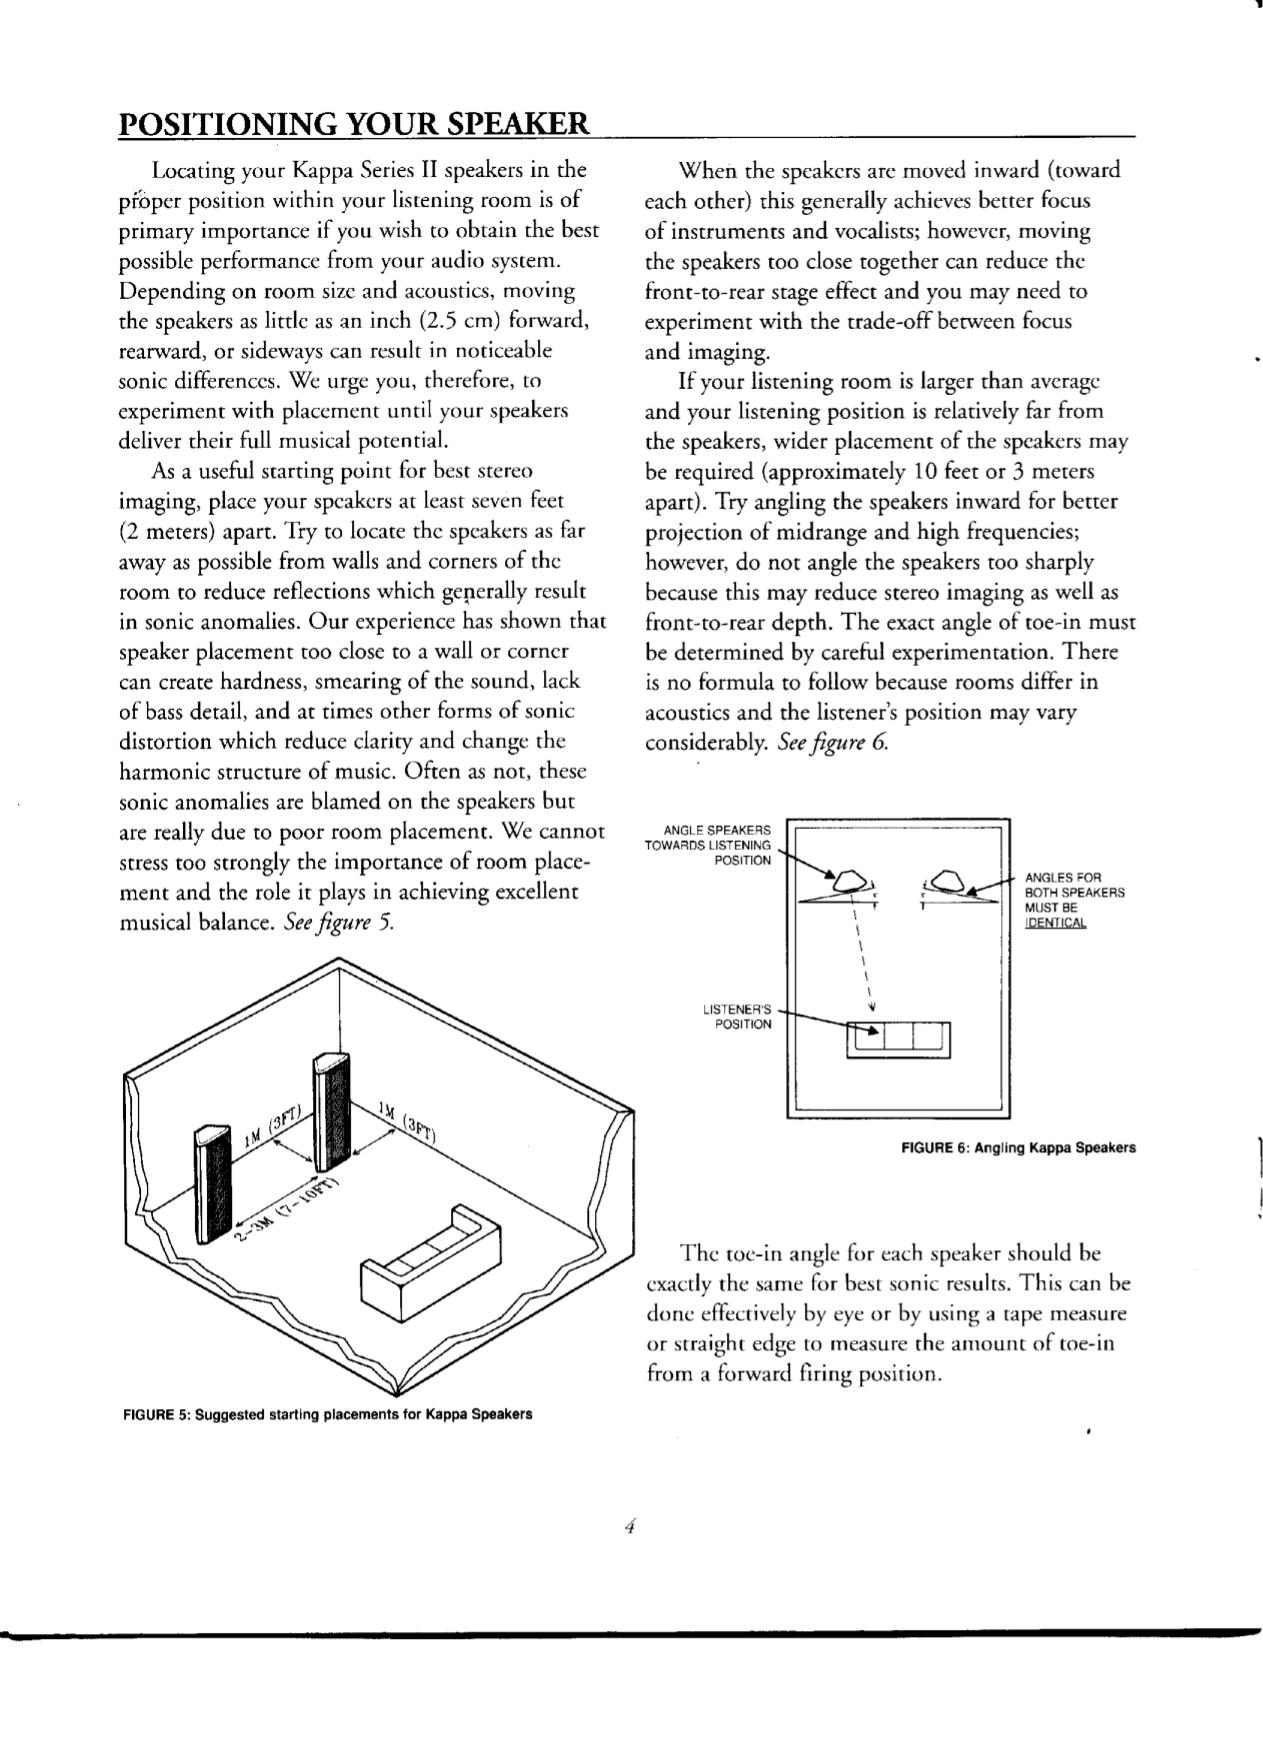 pdf manual for infinity car amplifier kappa series kappa one rh umlib com Kindle Fire User Guide Online User Guide